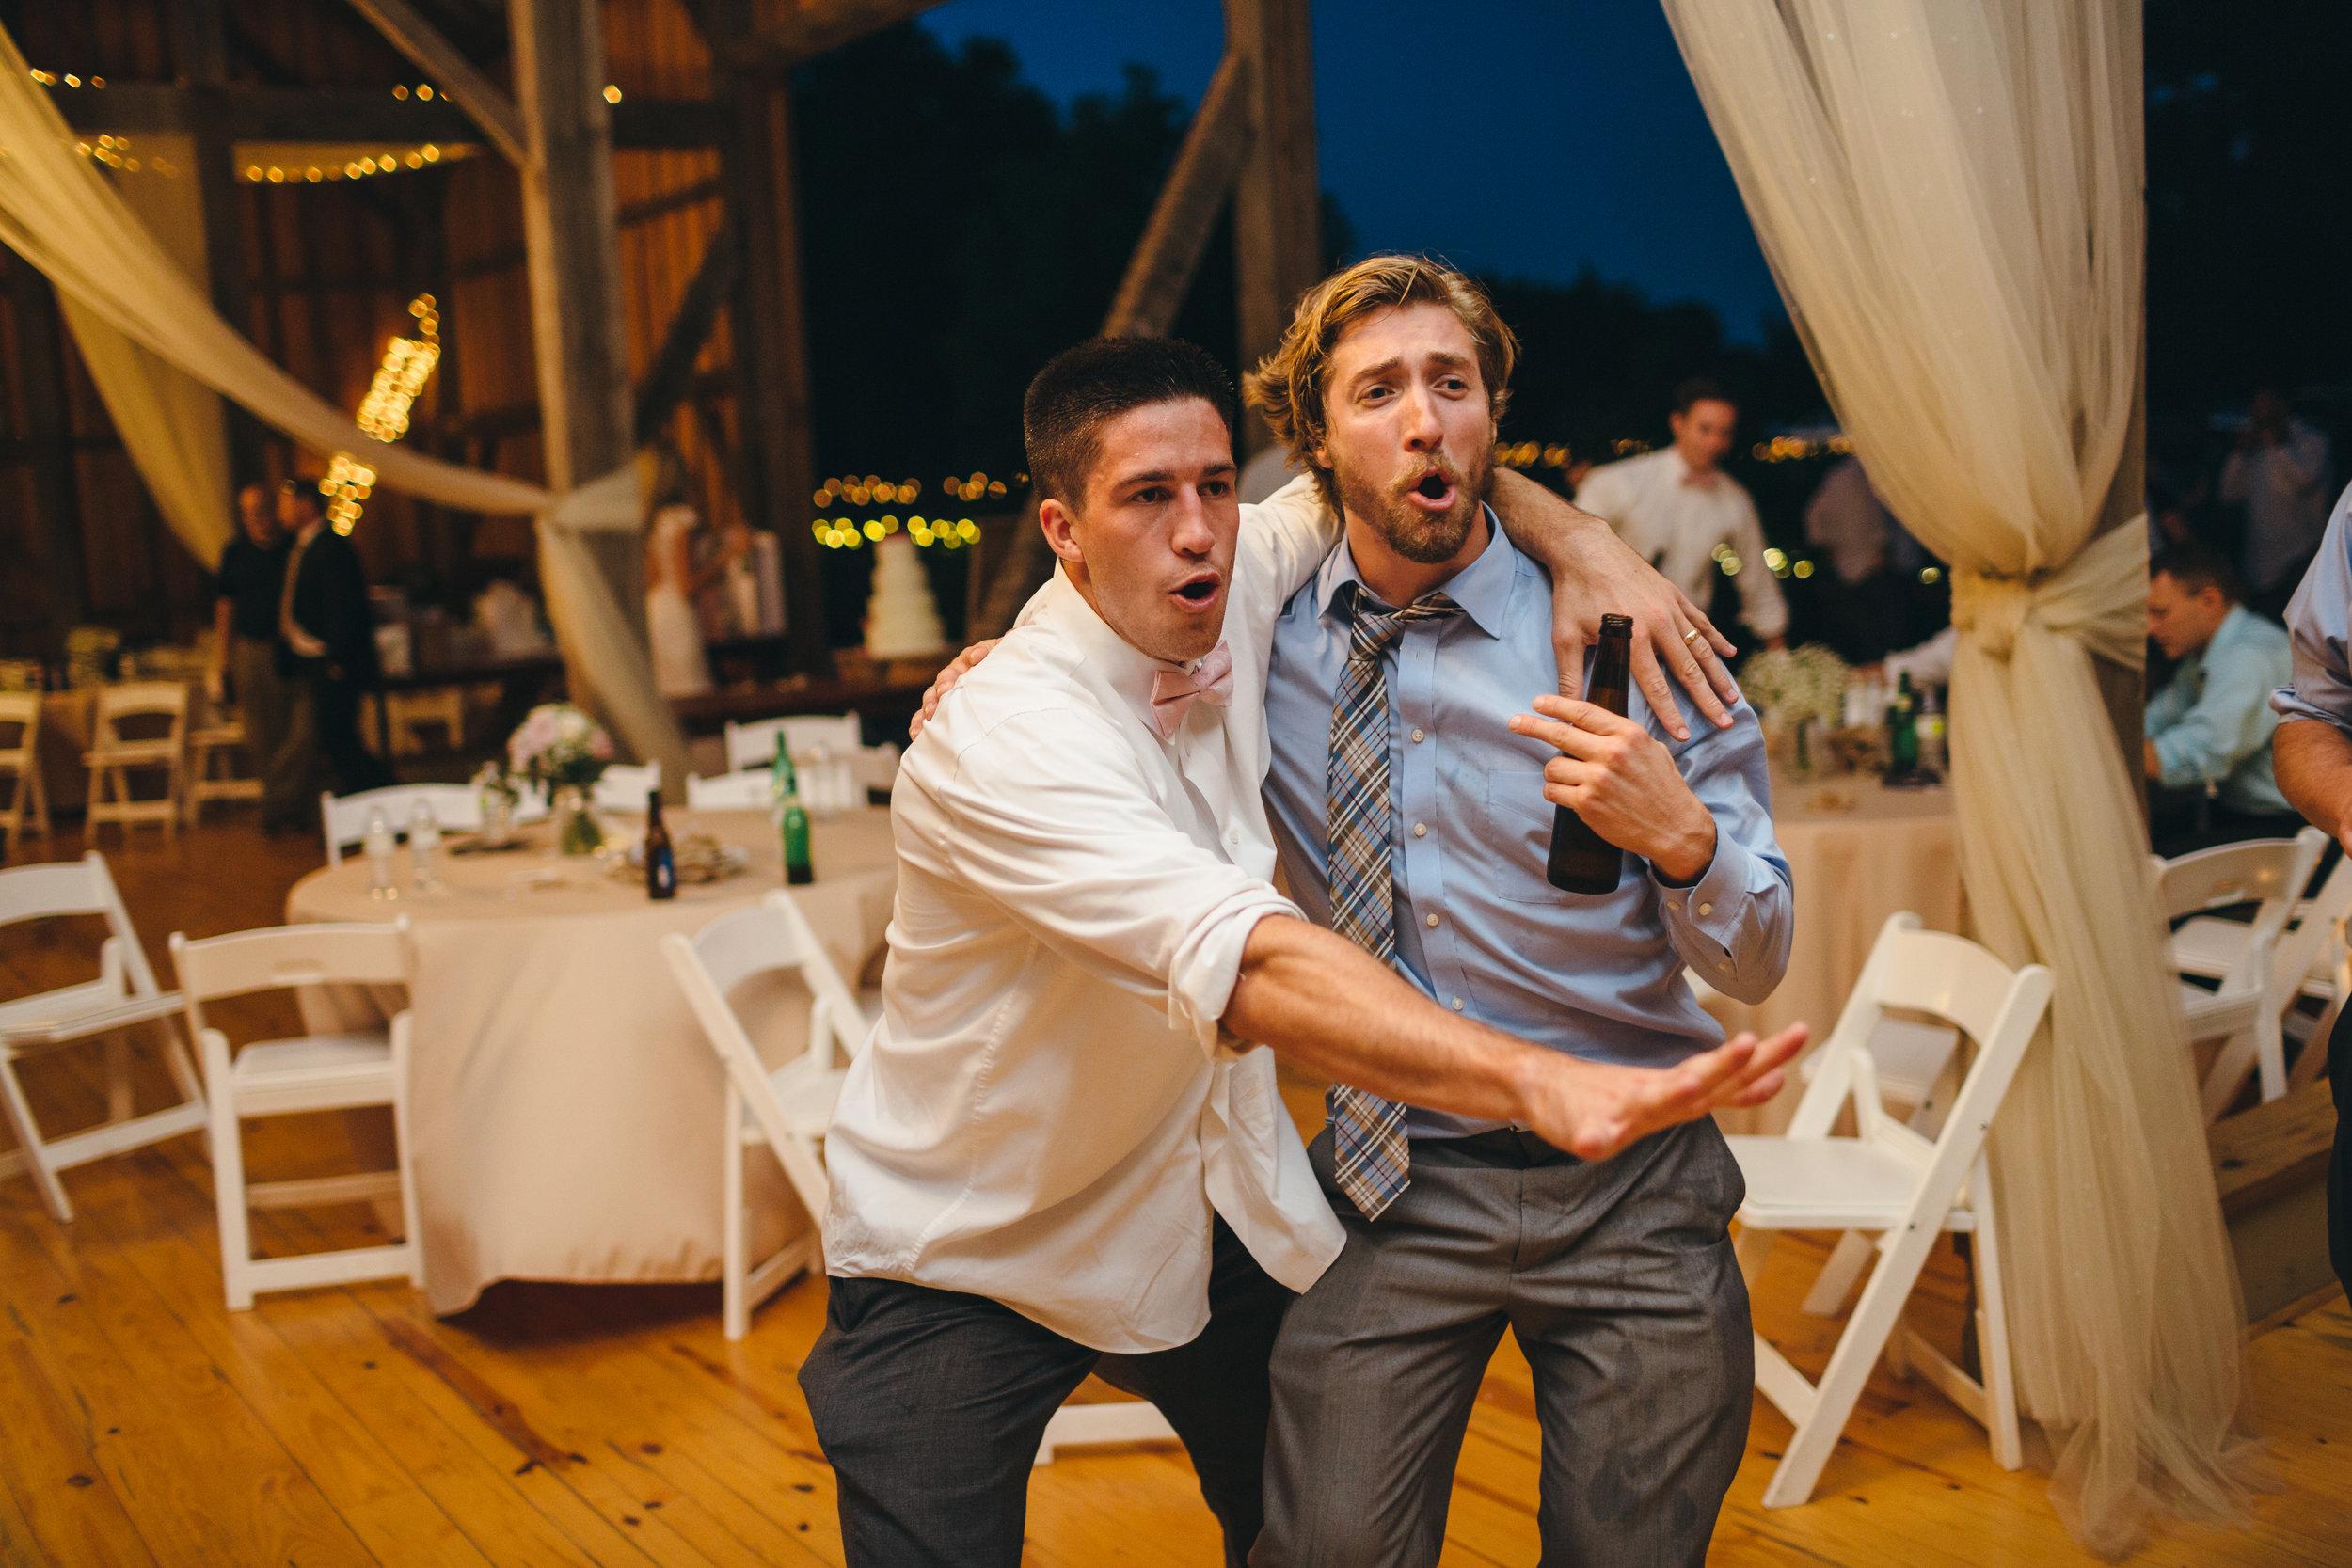 Lynchburg Wedding Photographer; Lynchburg Photographer; Lynchburg Wedding; Sorella Farms Wedding; Virginia Wedding Photographer; Virginia Wedding-30.jpg